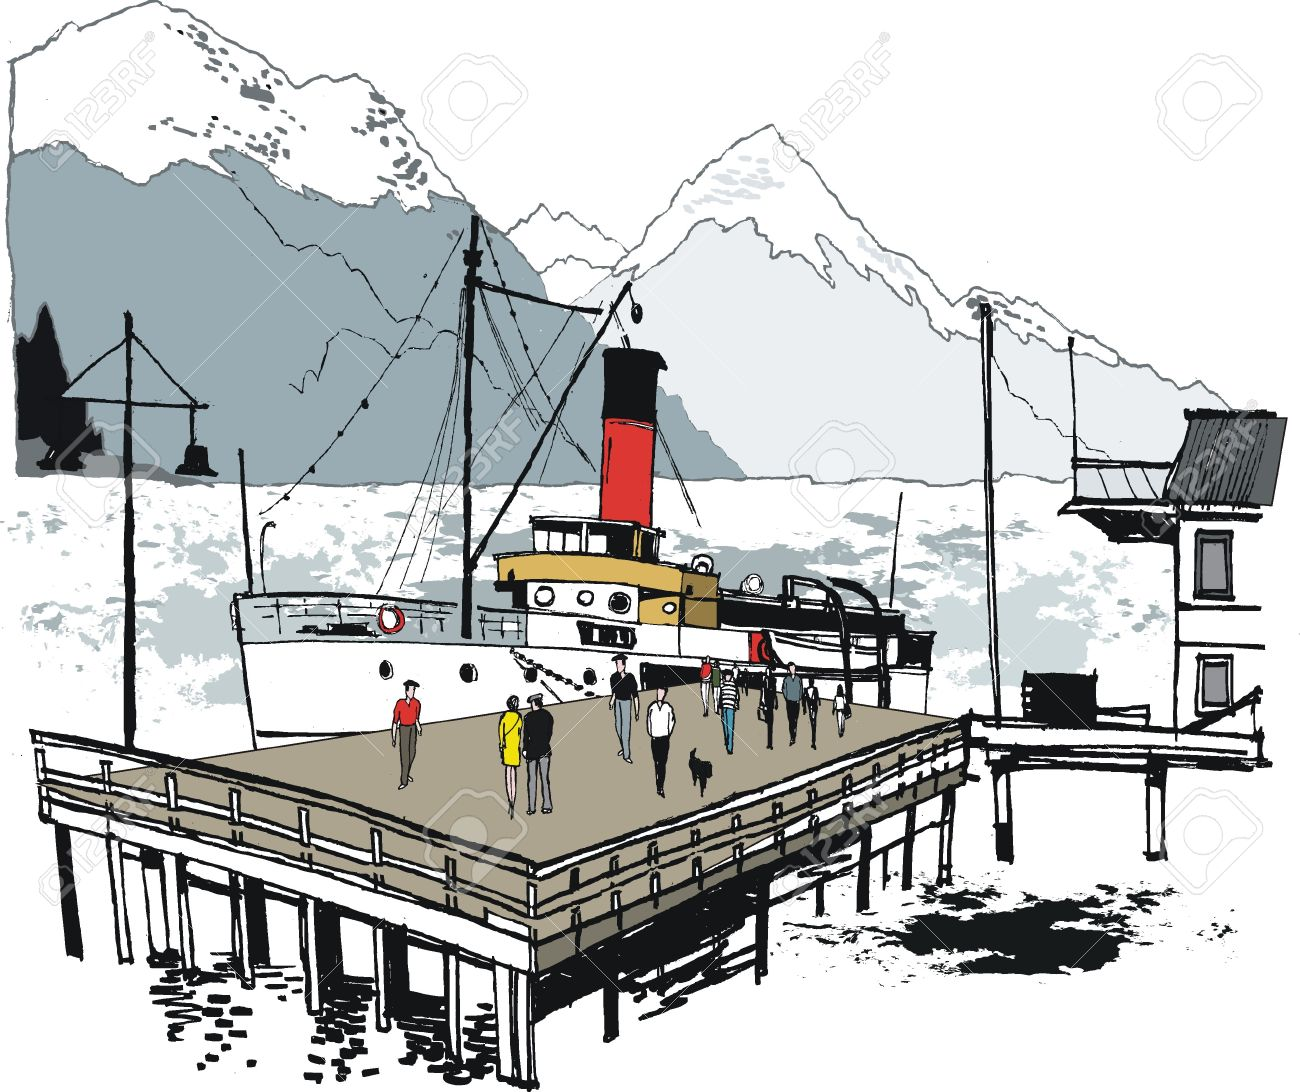 Vector illustration of vintage steamer, Queenstown, New Zealand Stock Vector - 15783370